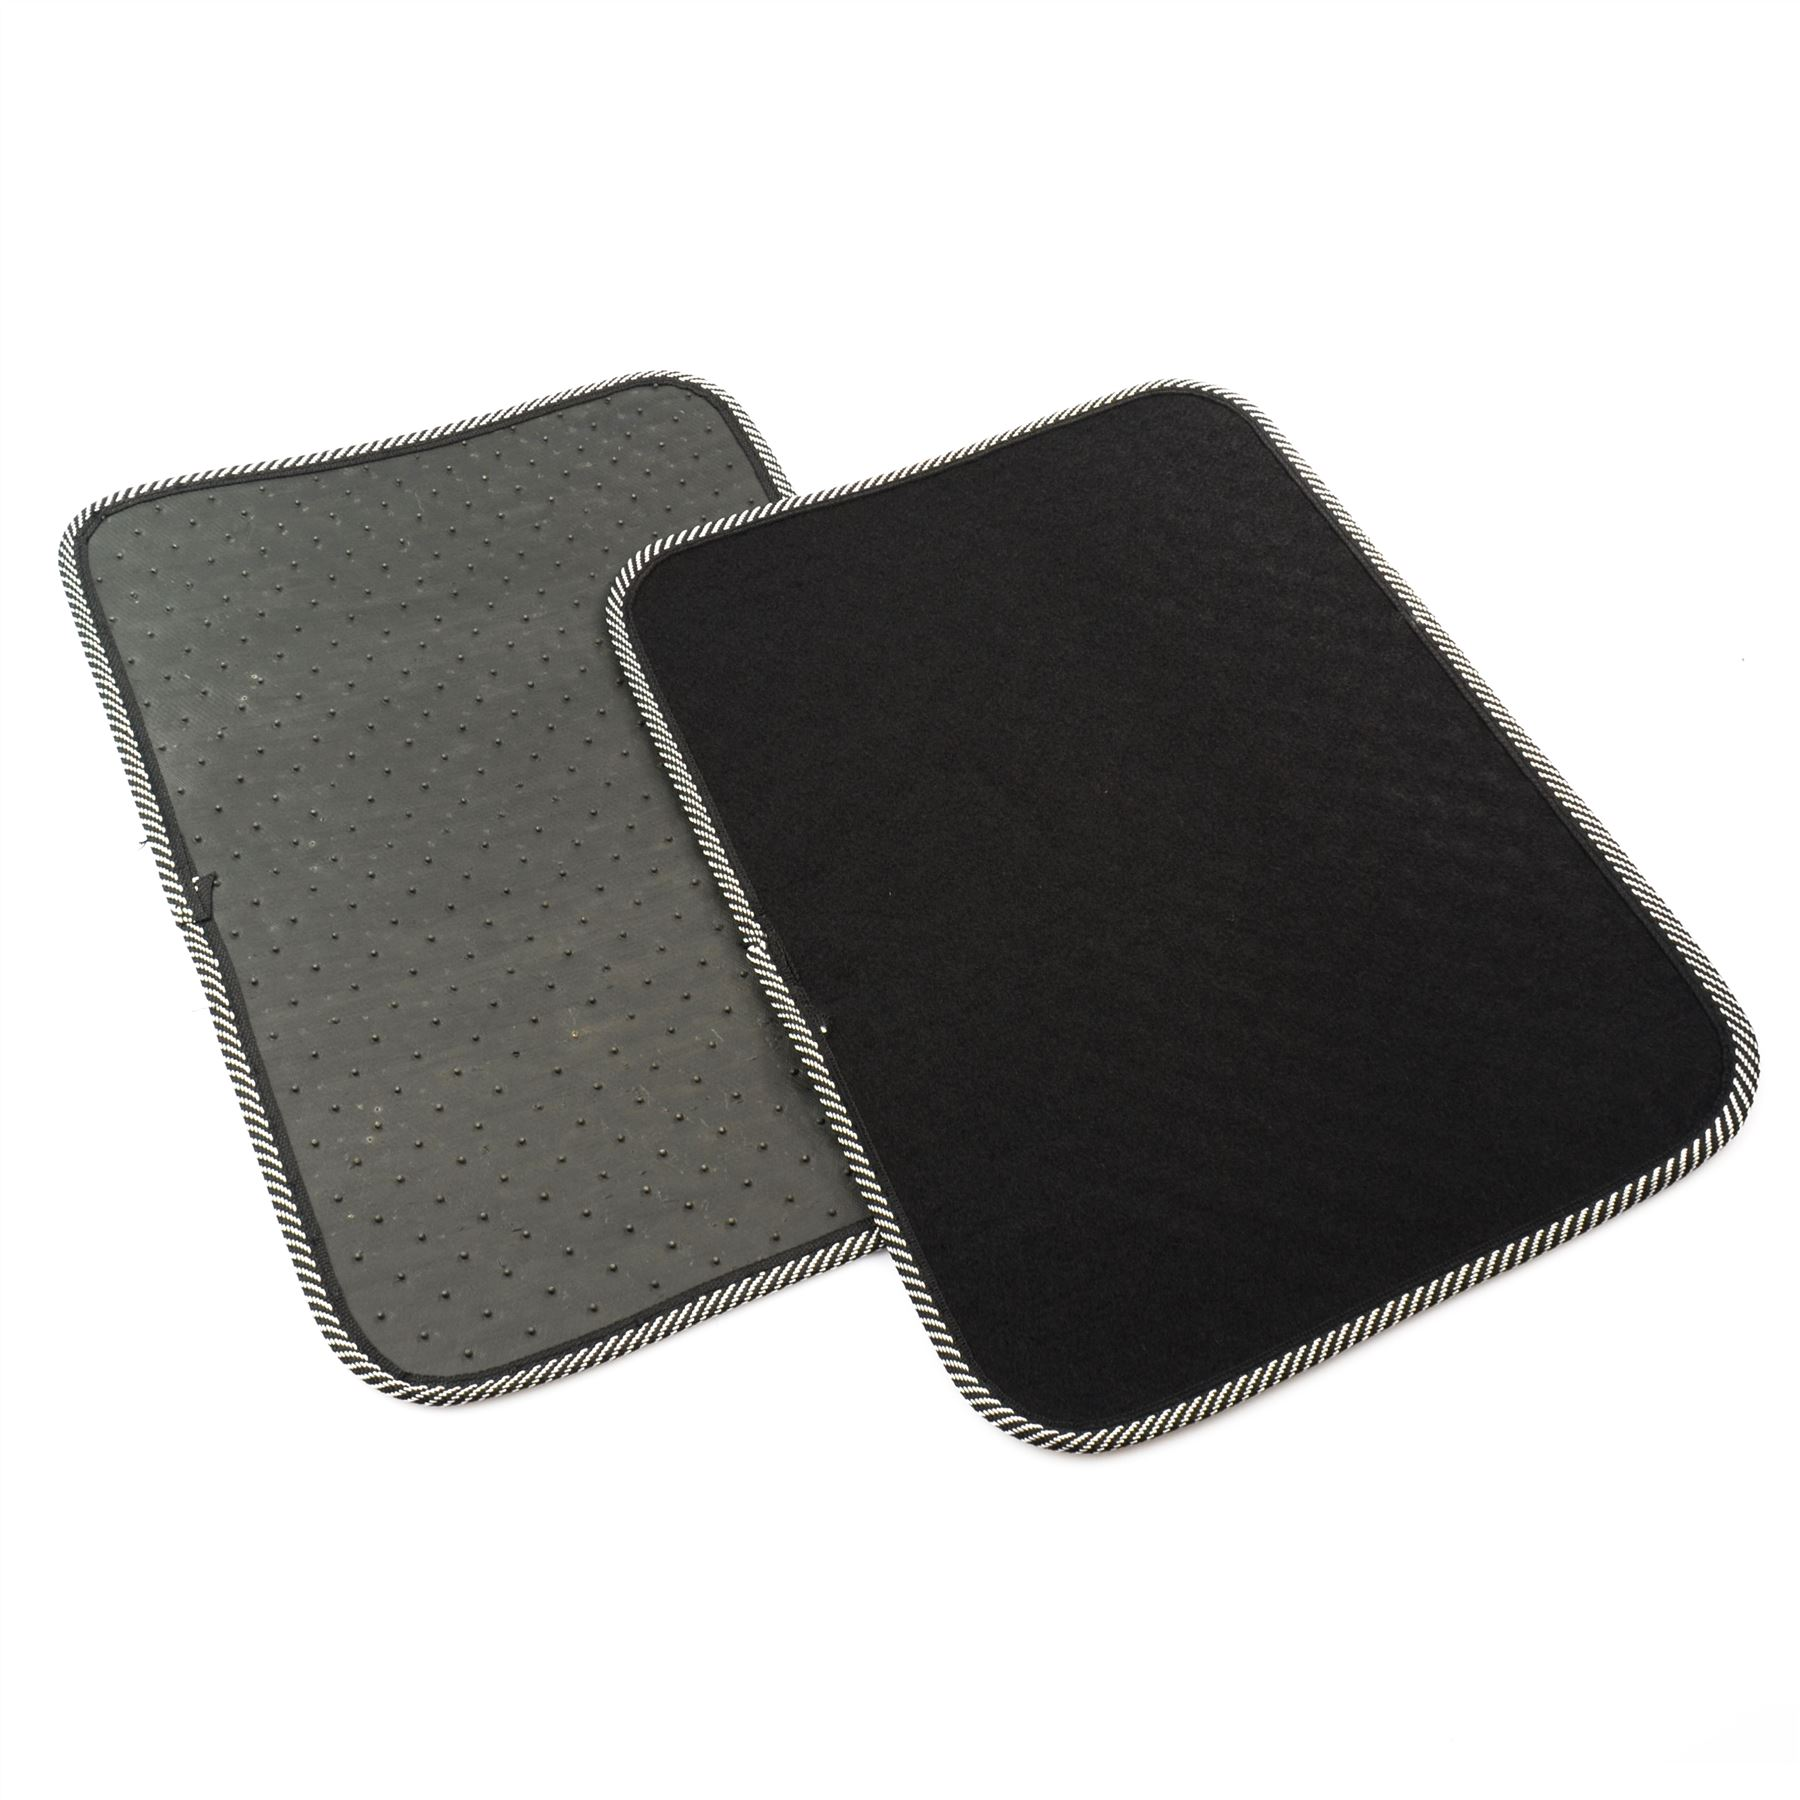 New Universal Car Floor Mats Rubber Carpets Non Slip Grip Front Rear Black